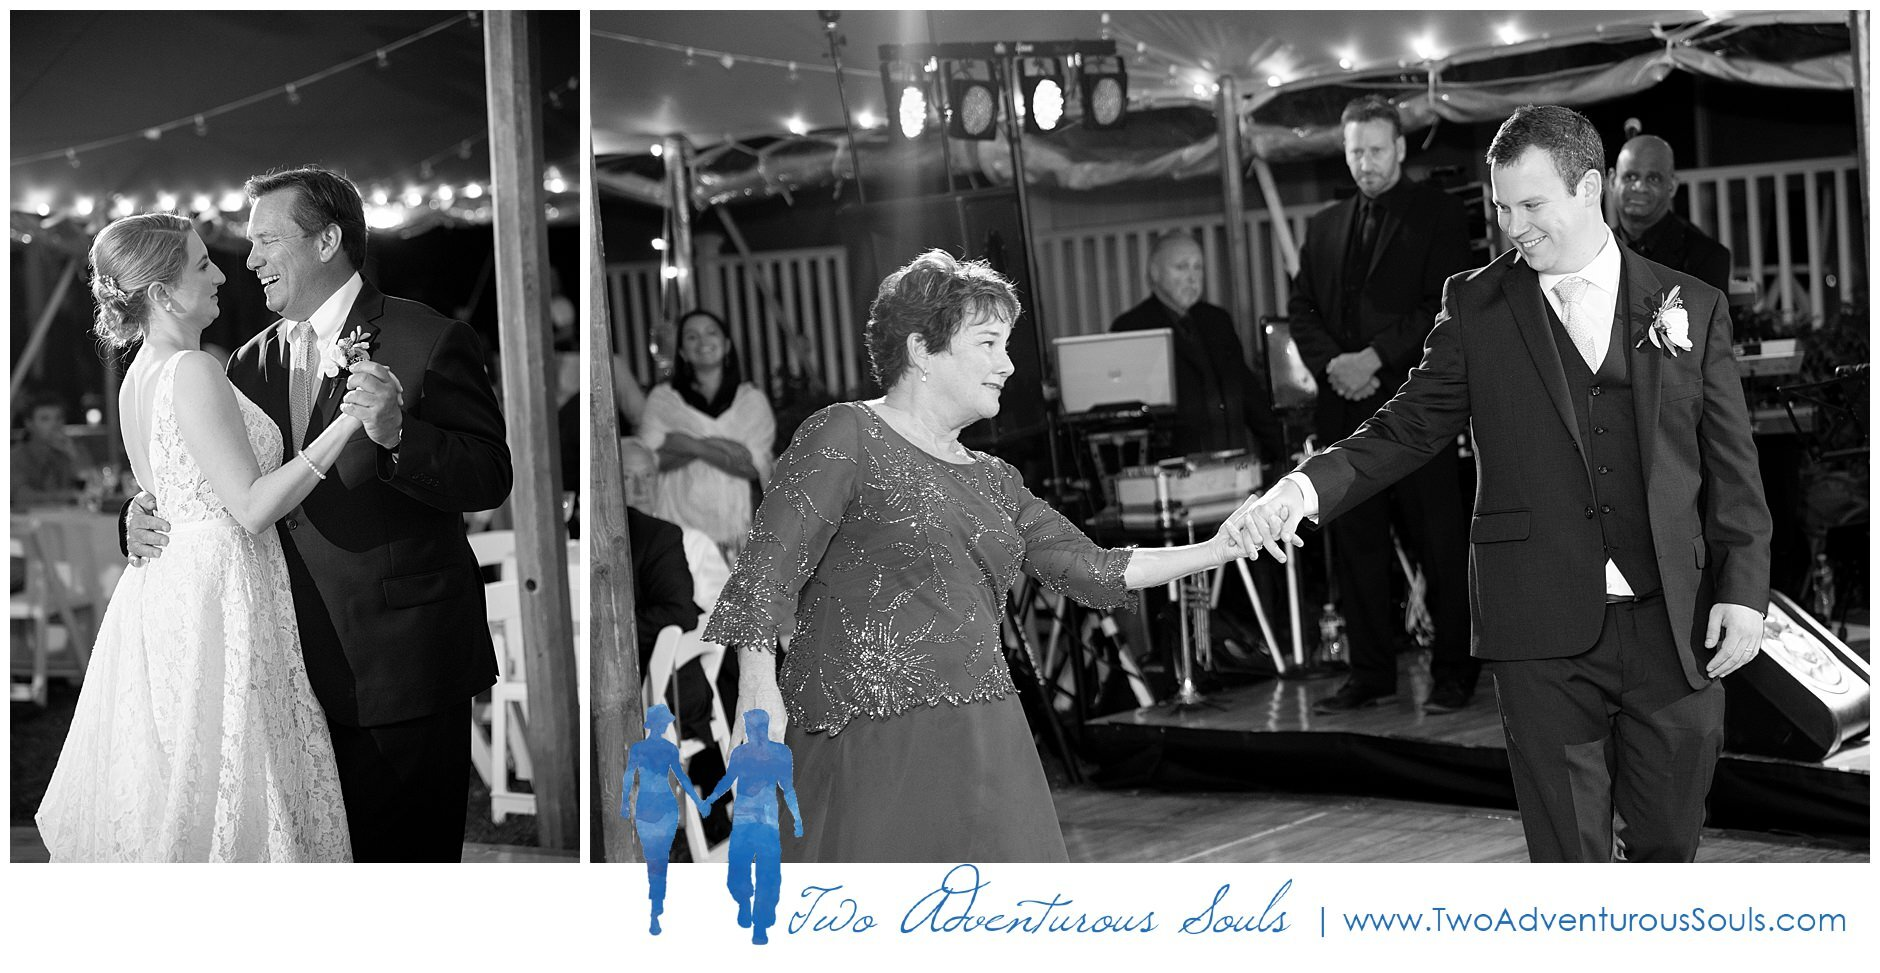 Breakwater Inn and Spa Wedding Photographers, Kennebunkport Wedding Photographers, Two Adventurous Souls- 092119_0059.jpg